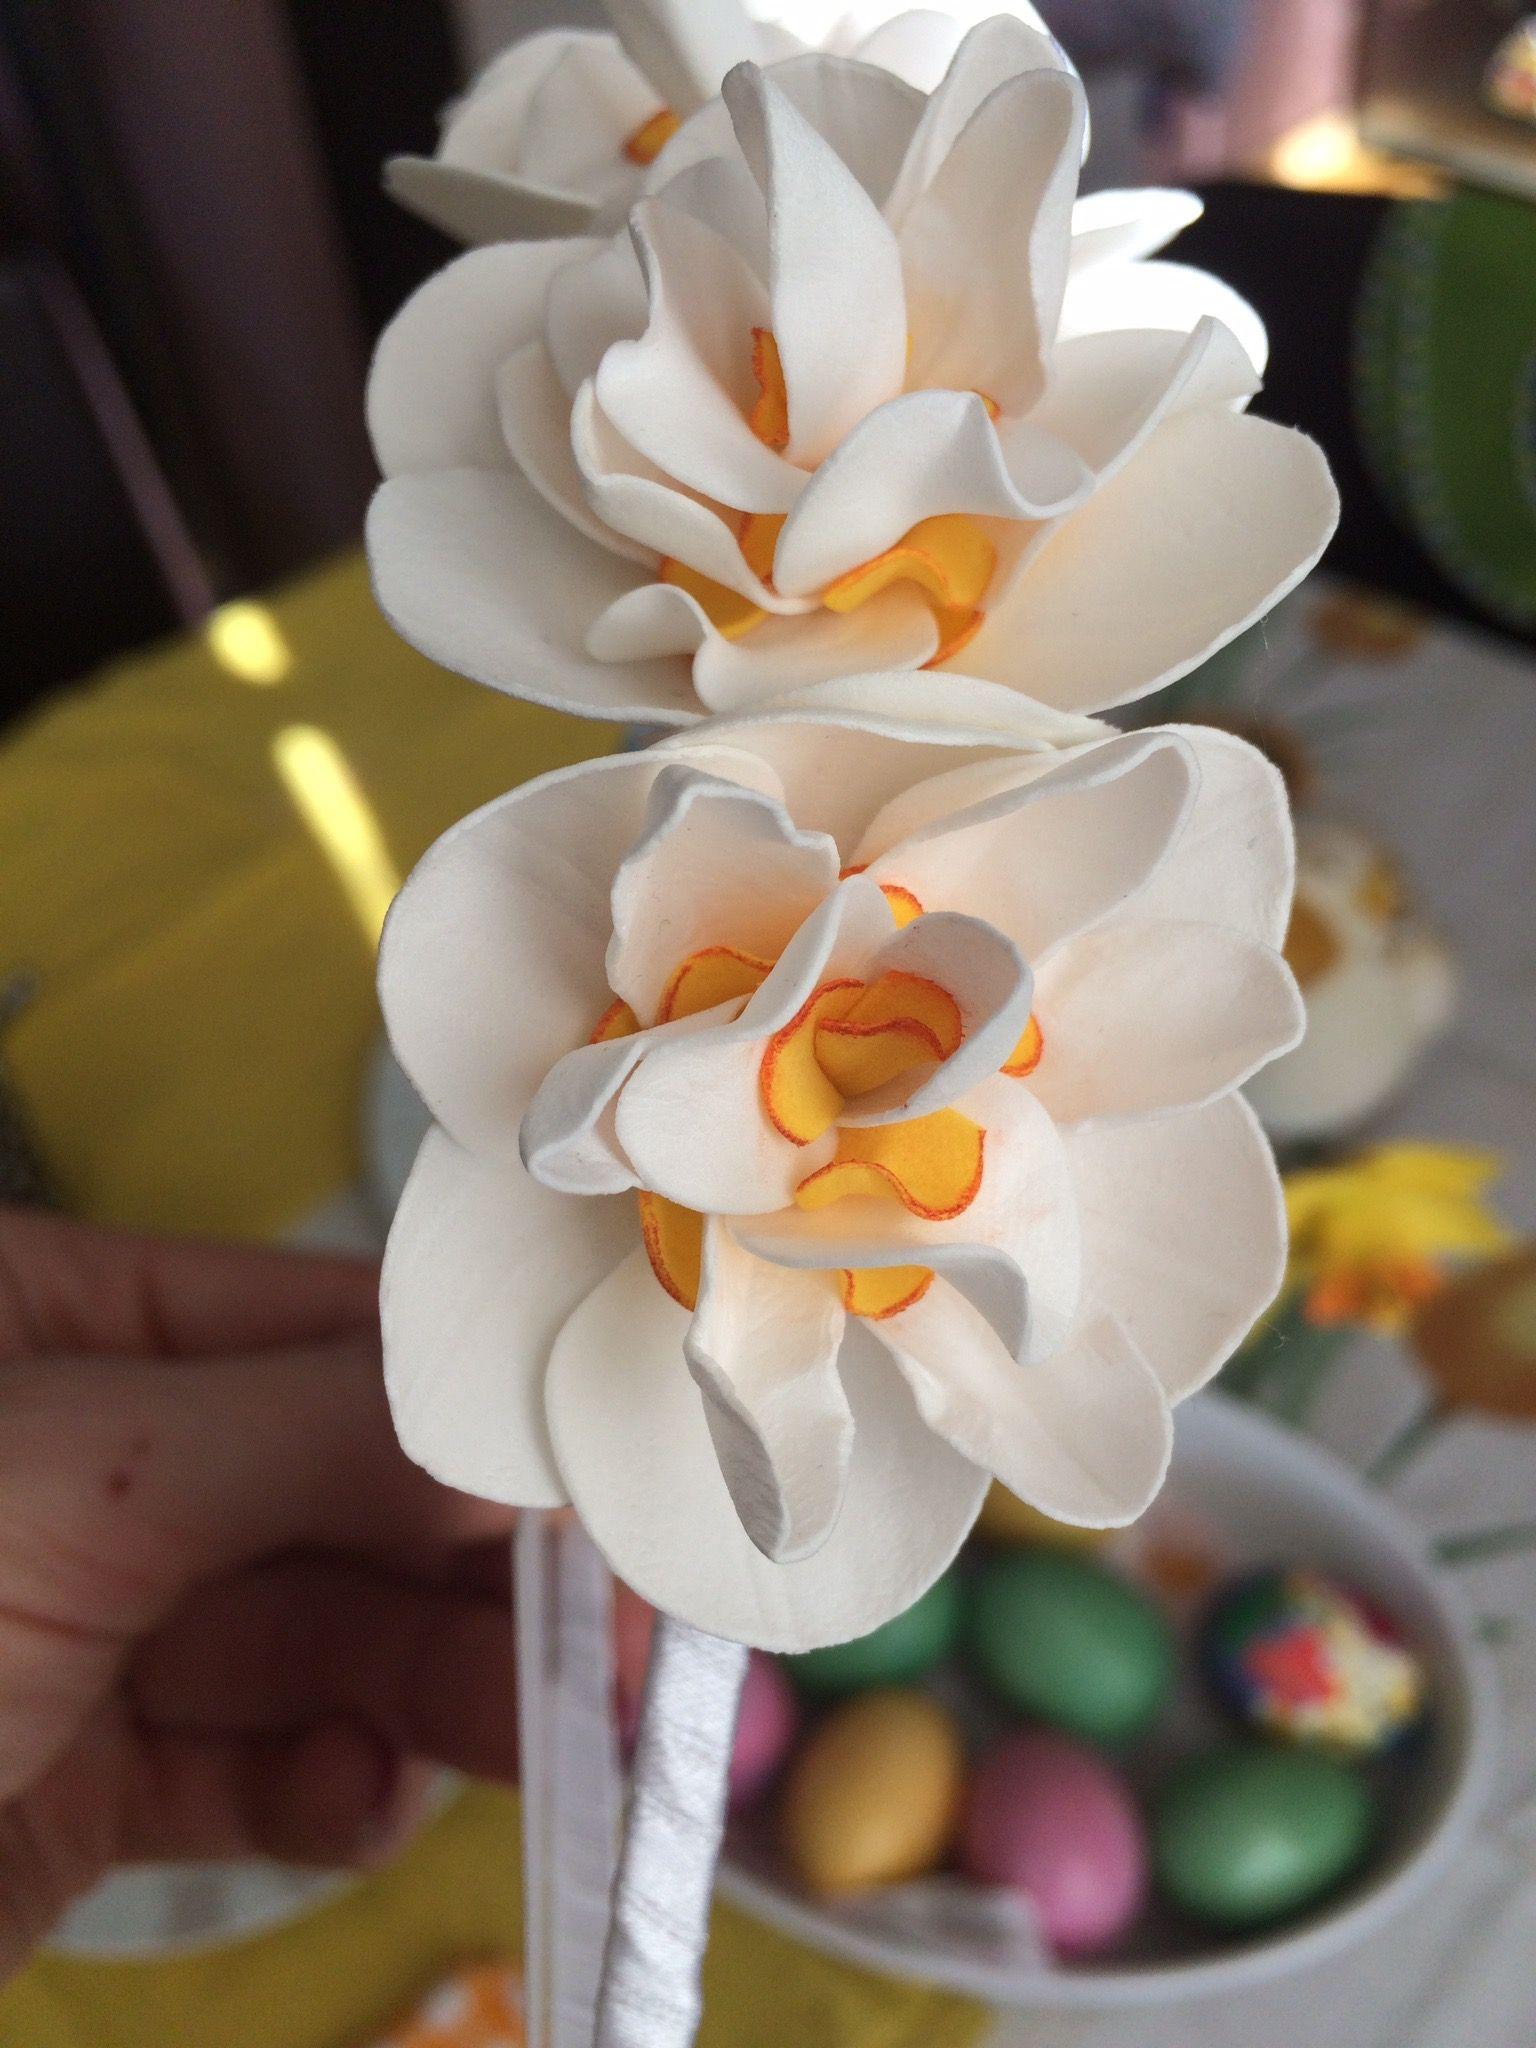 My flowers, handmade, foam, eva, bride, hair, made with love